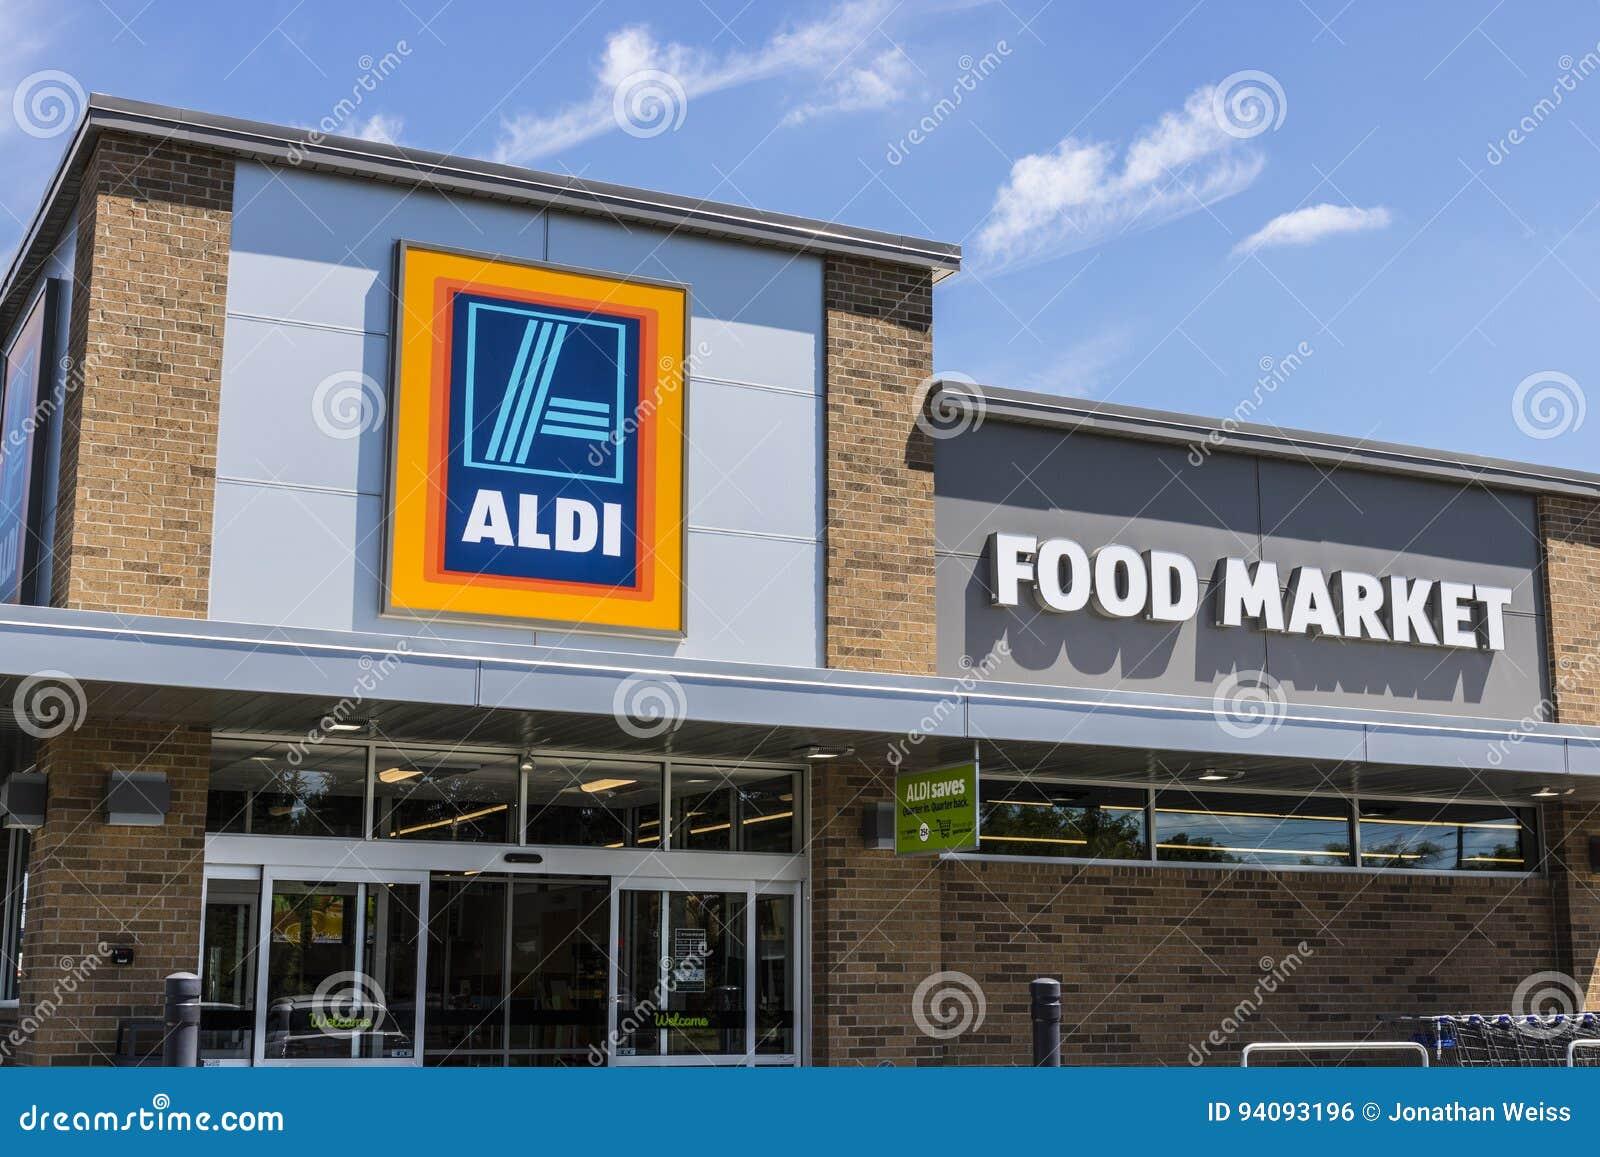 Indianapolis - Circa June 2017: Aldi Discount Supermarket. Aldi sells a range of grocery items at discount prices IX